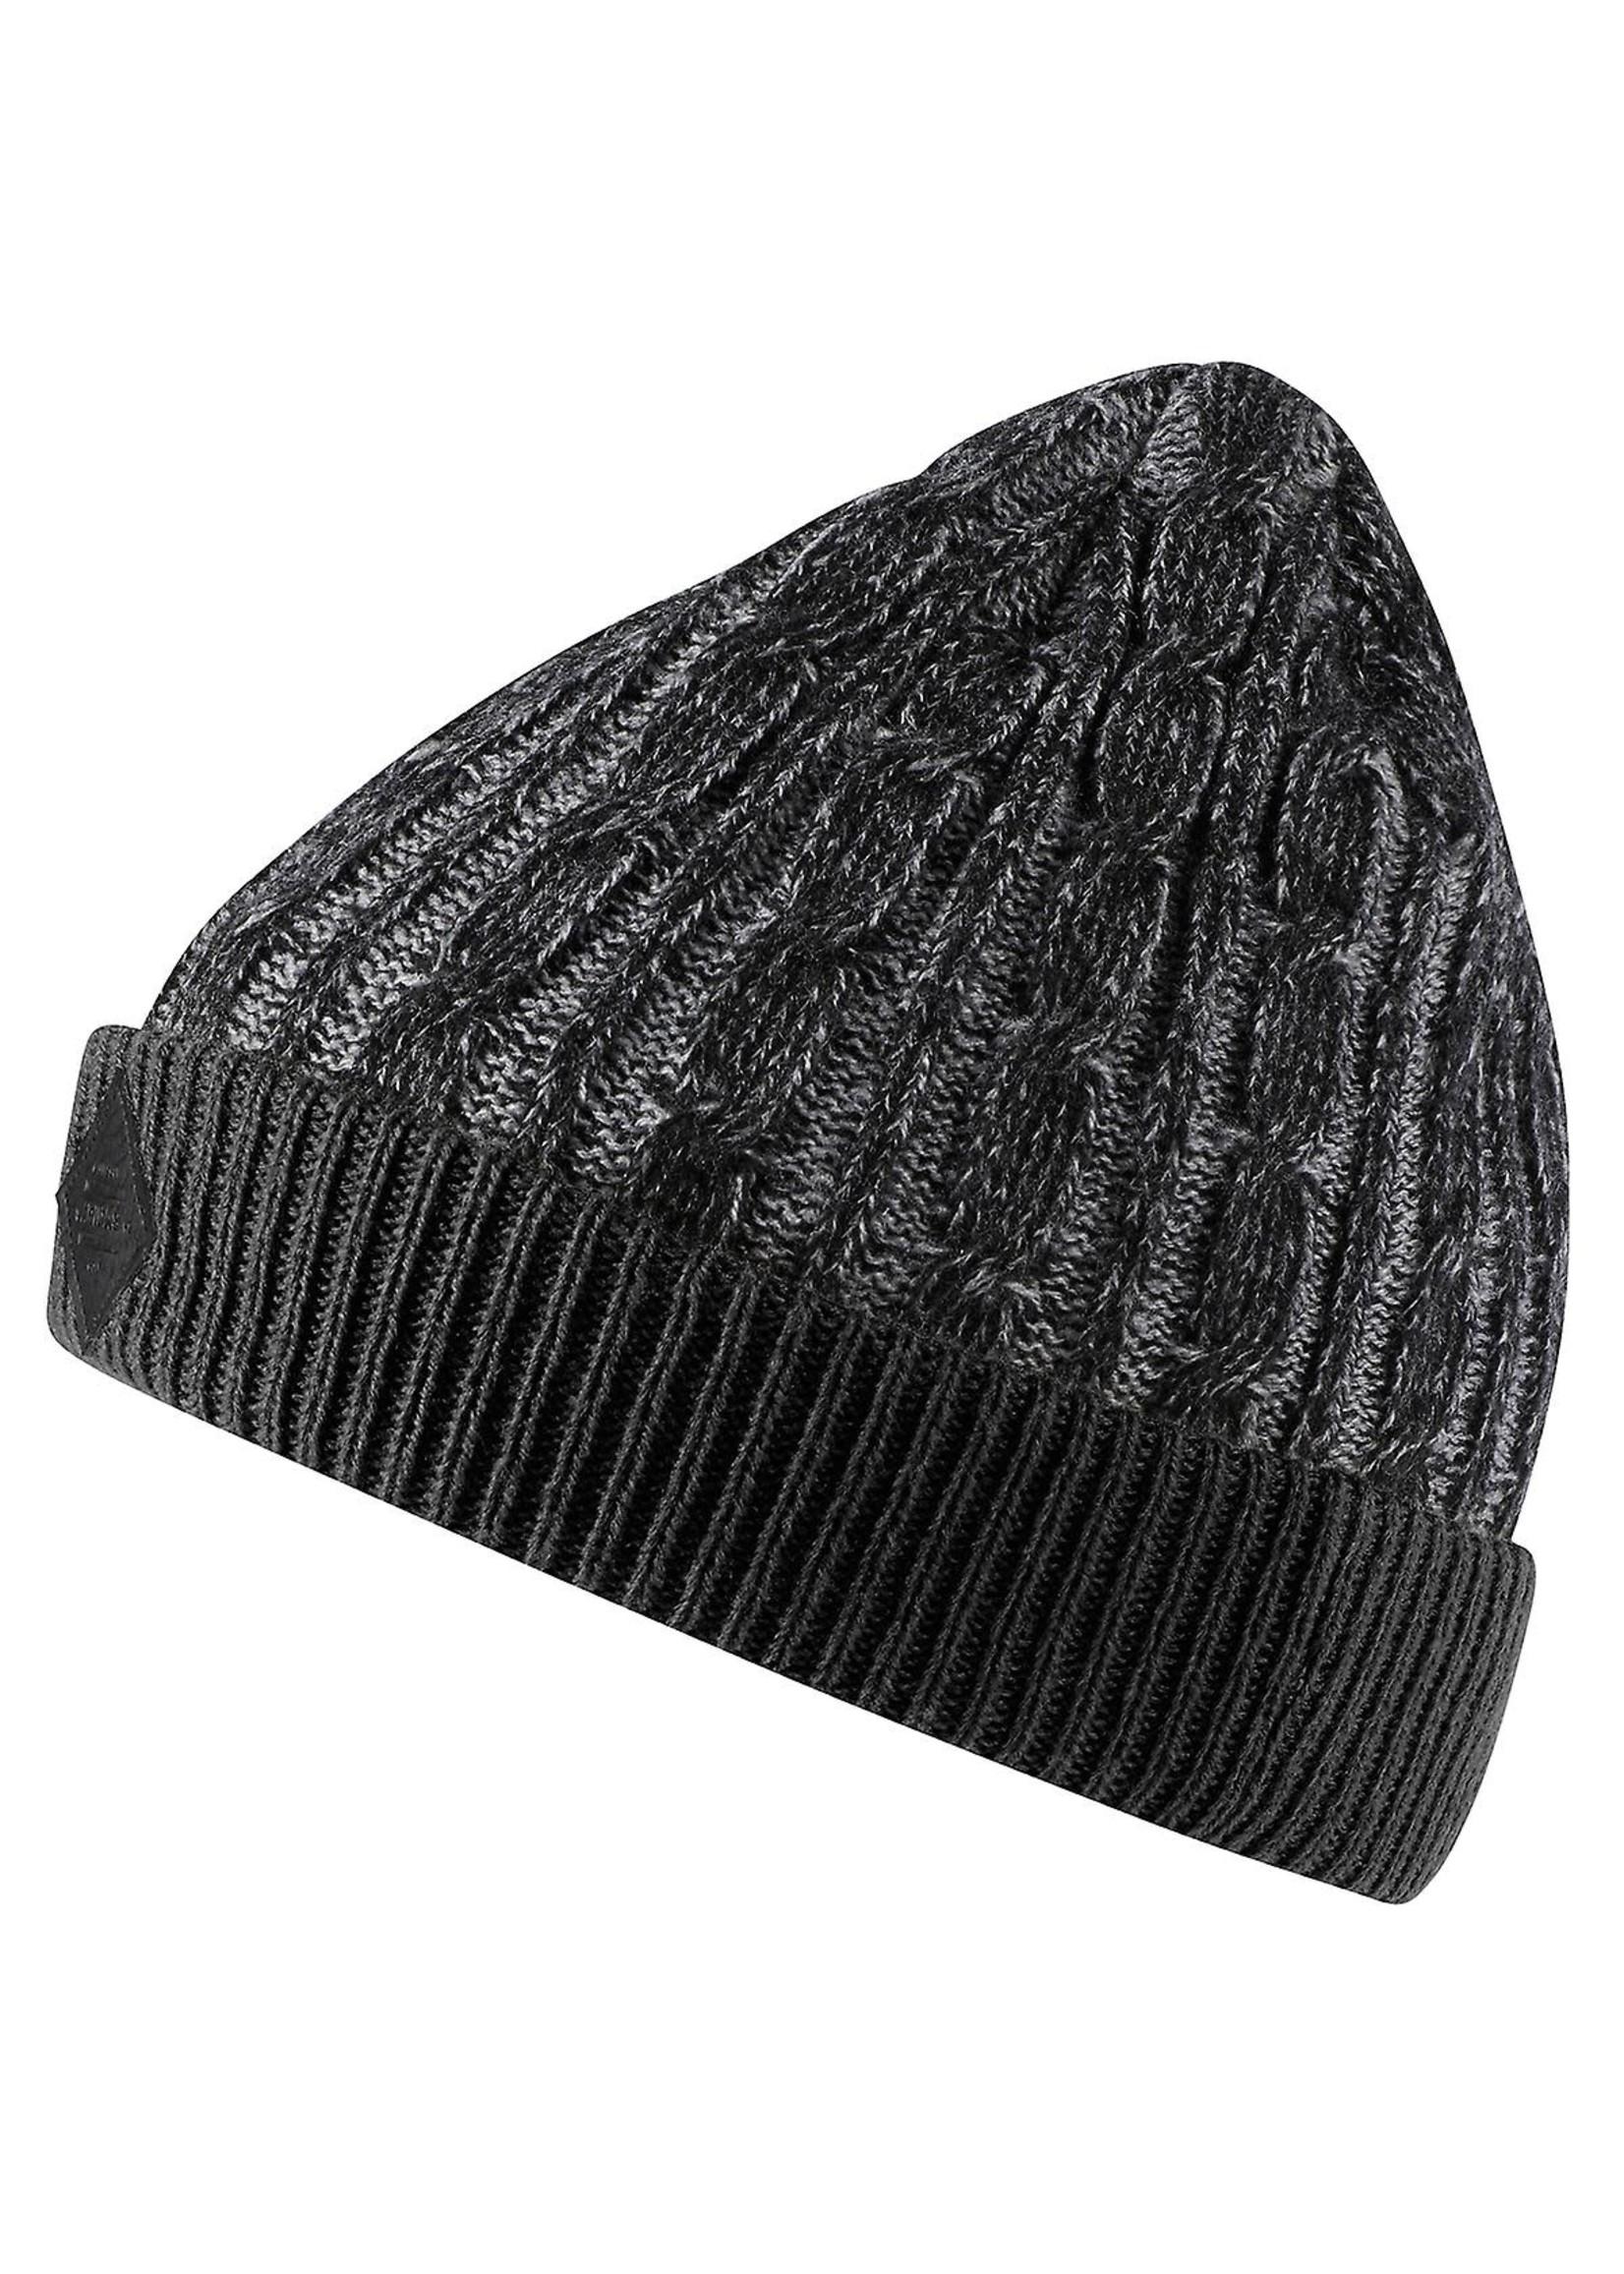 Adidas Adidas Knit Cable Golf Beanie Black